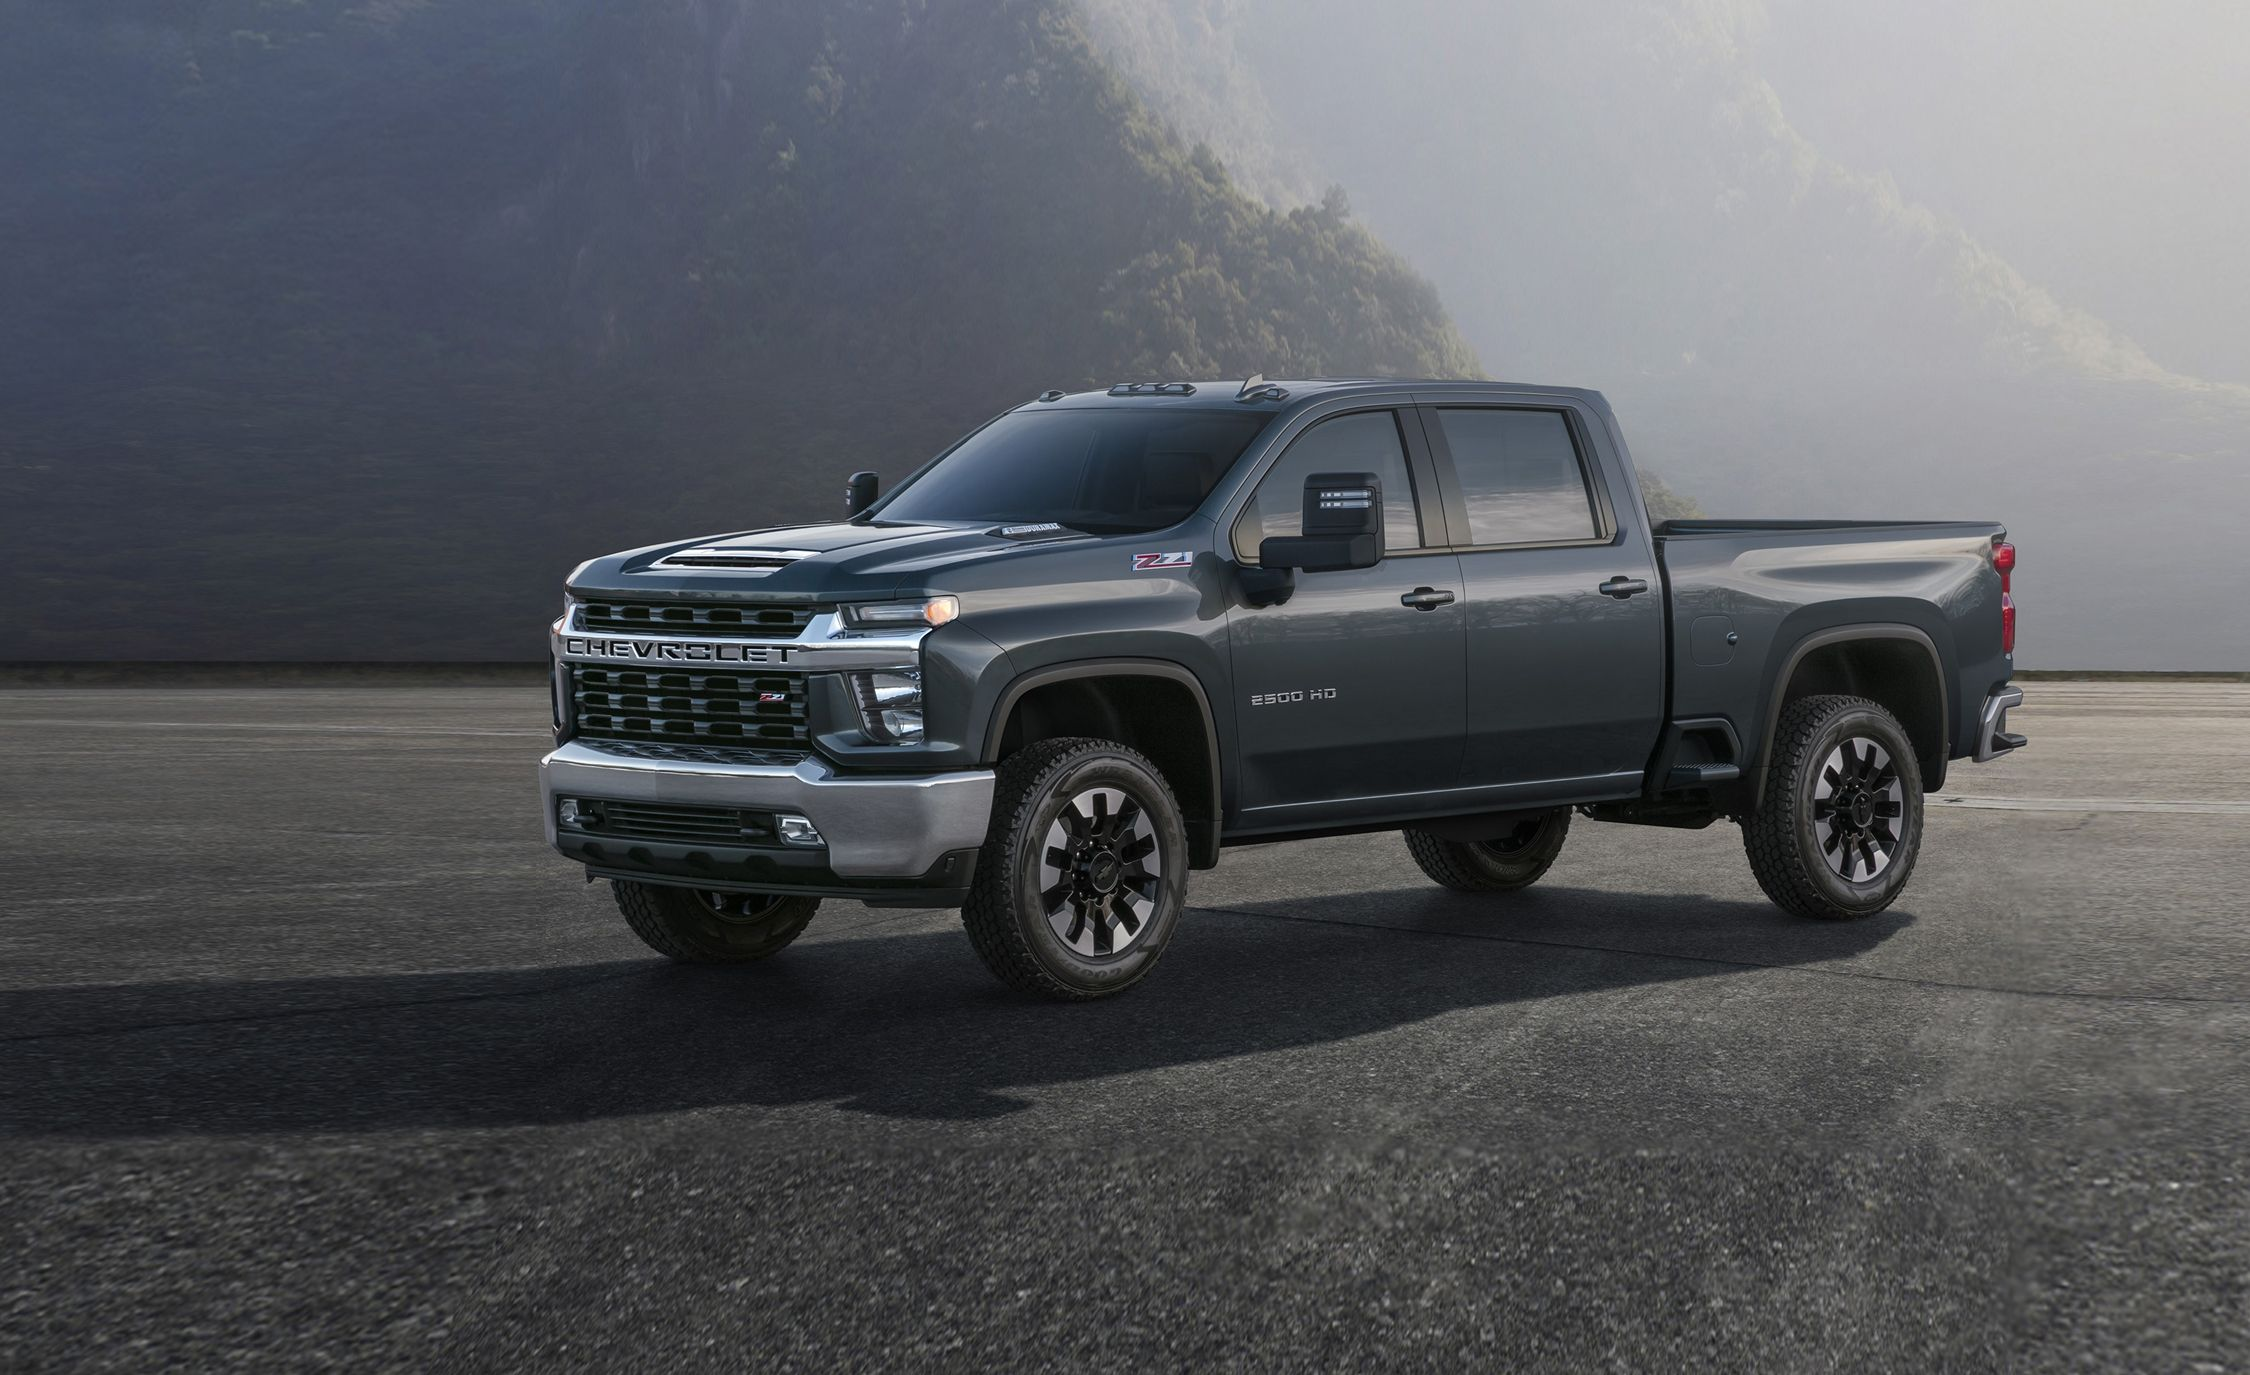 2020 Chevrolet Silverado HD - Heavy Duty Trucks Get a New Look